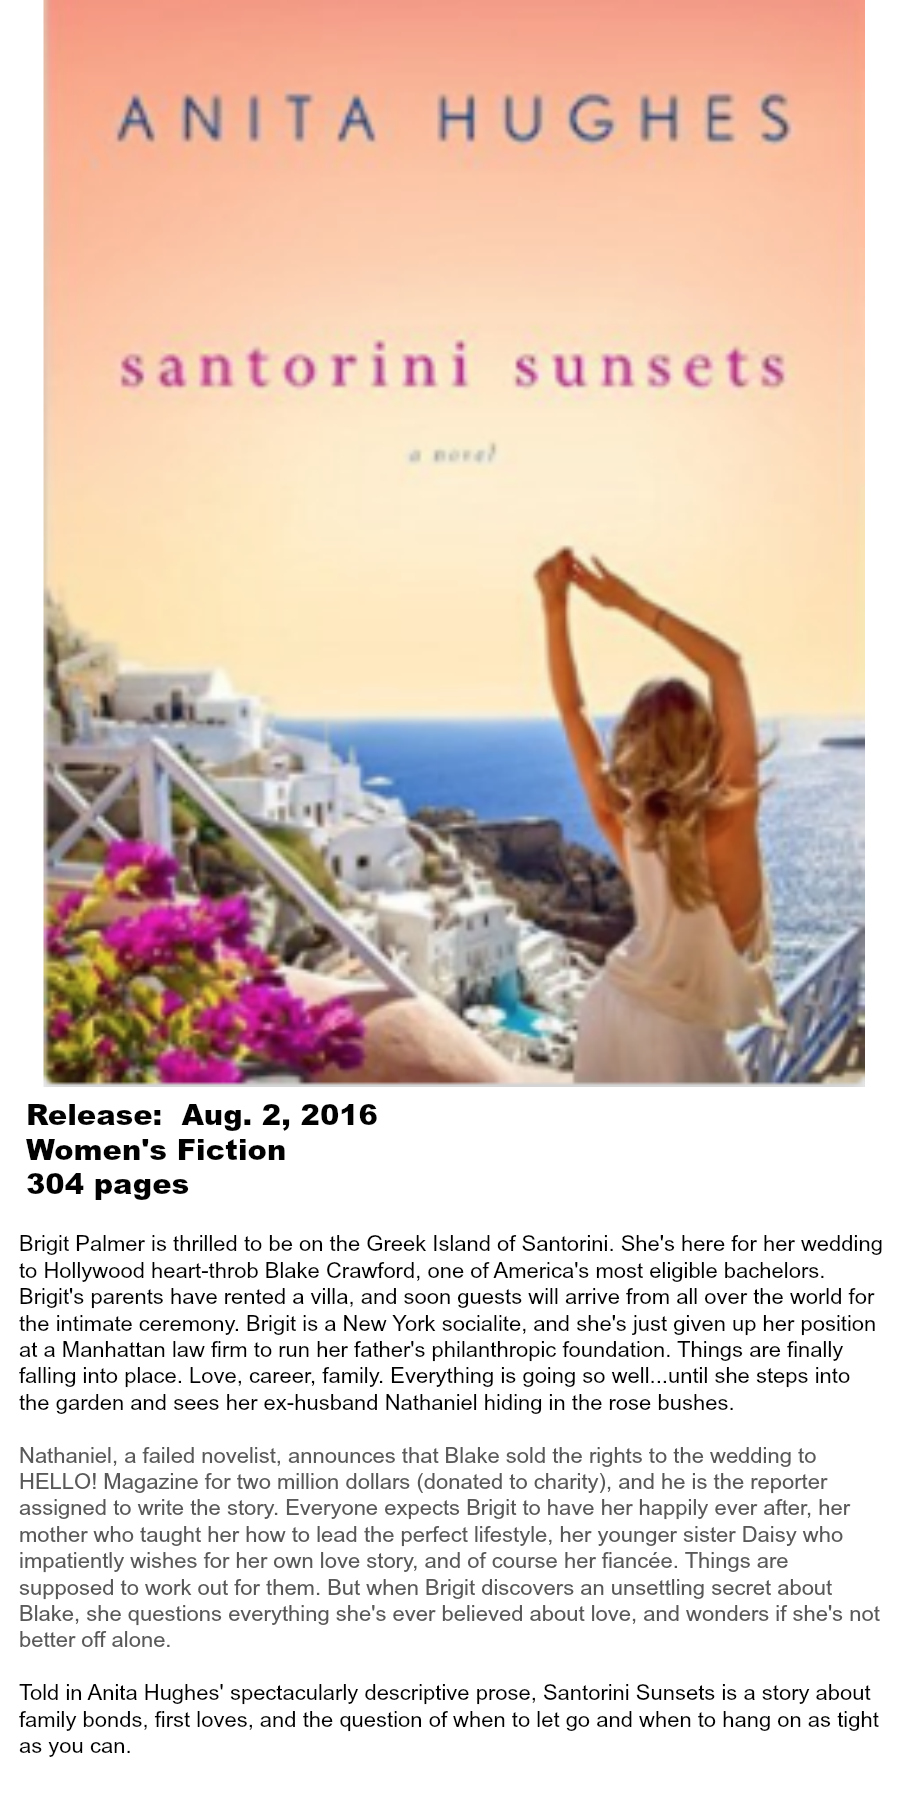 Must-read Books of Summer 2016 - Santorini Sunsets Anita Hughes